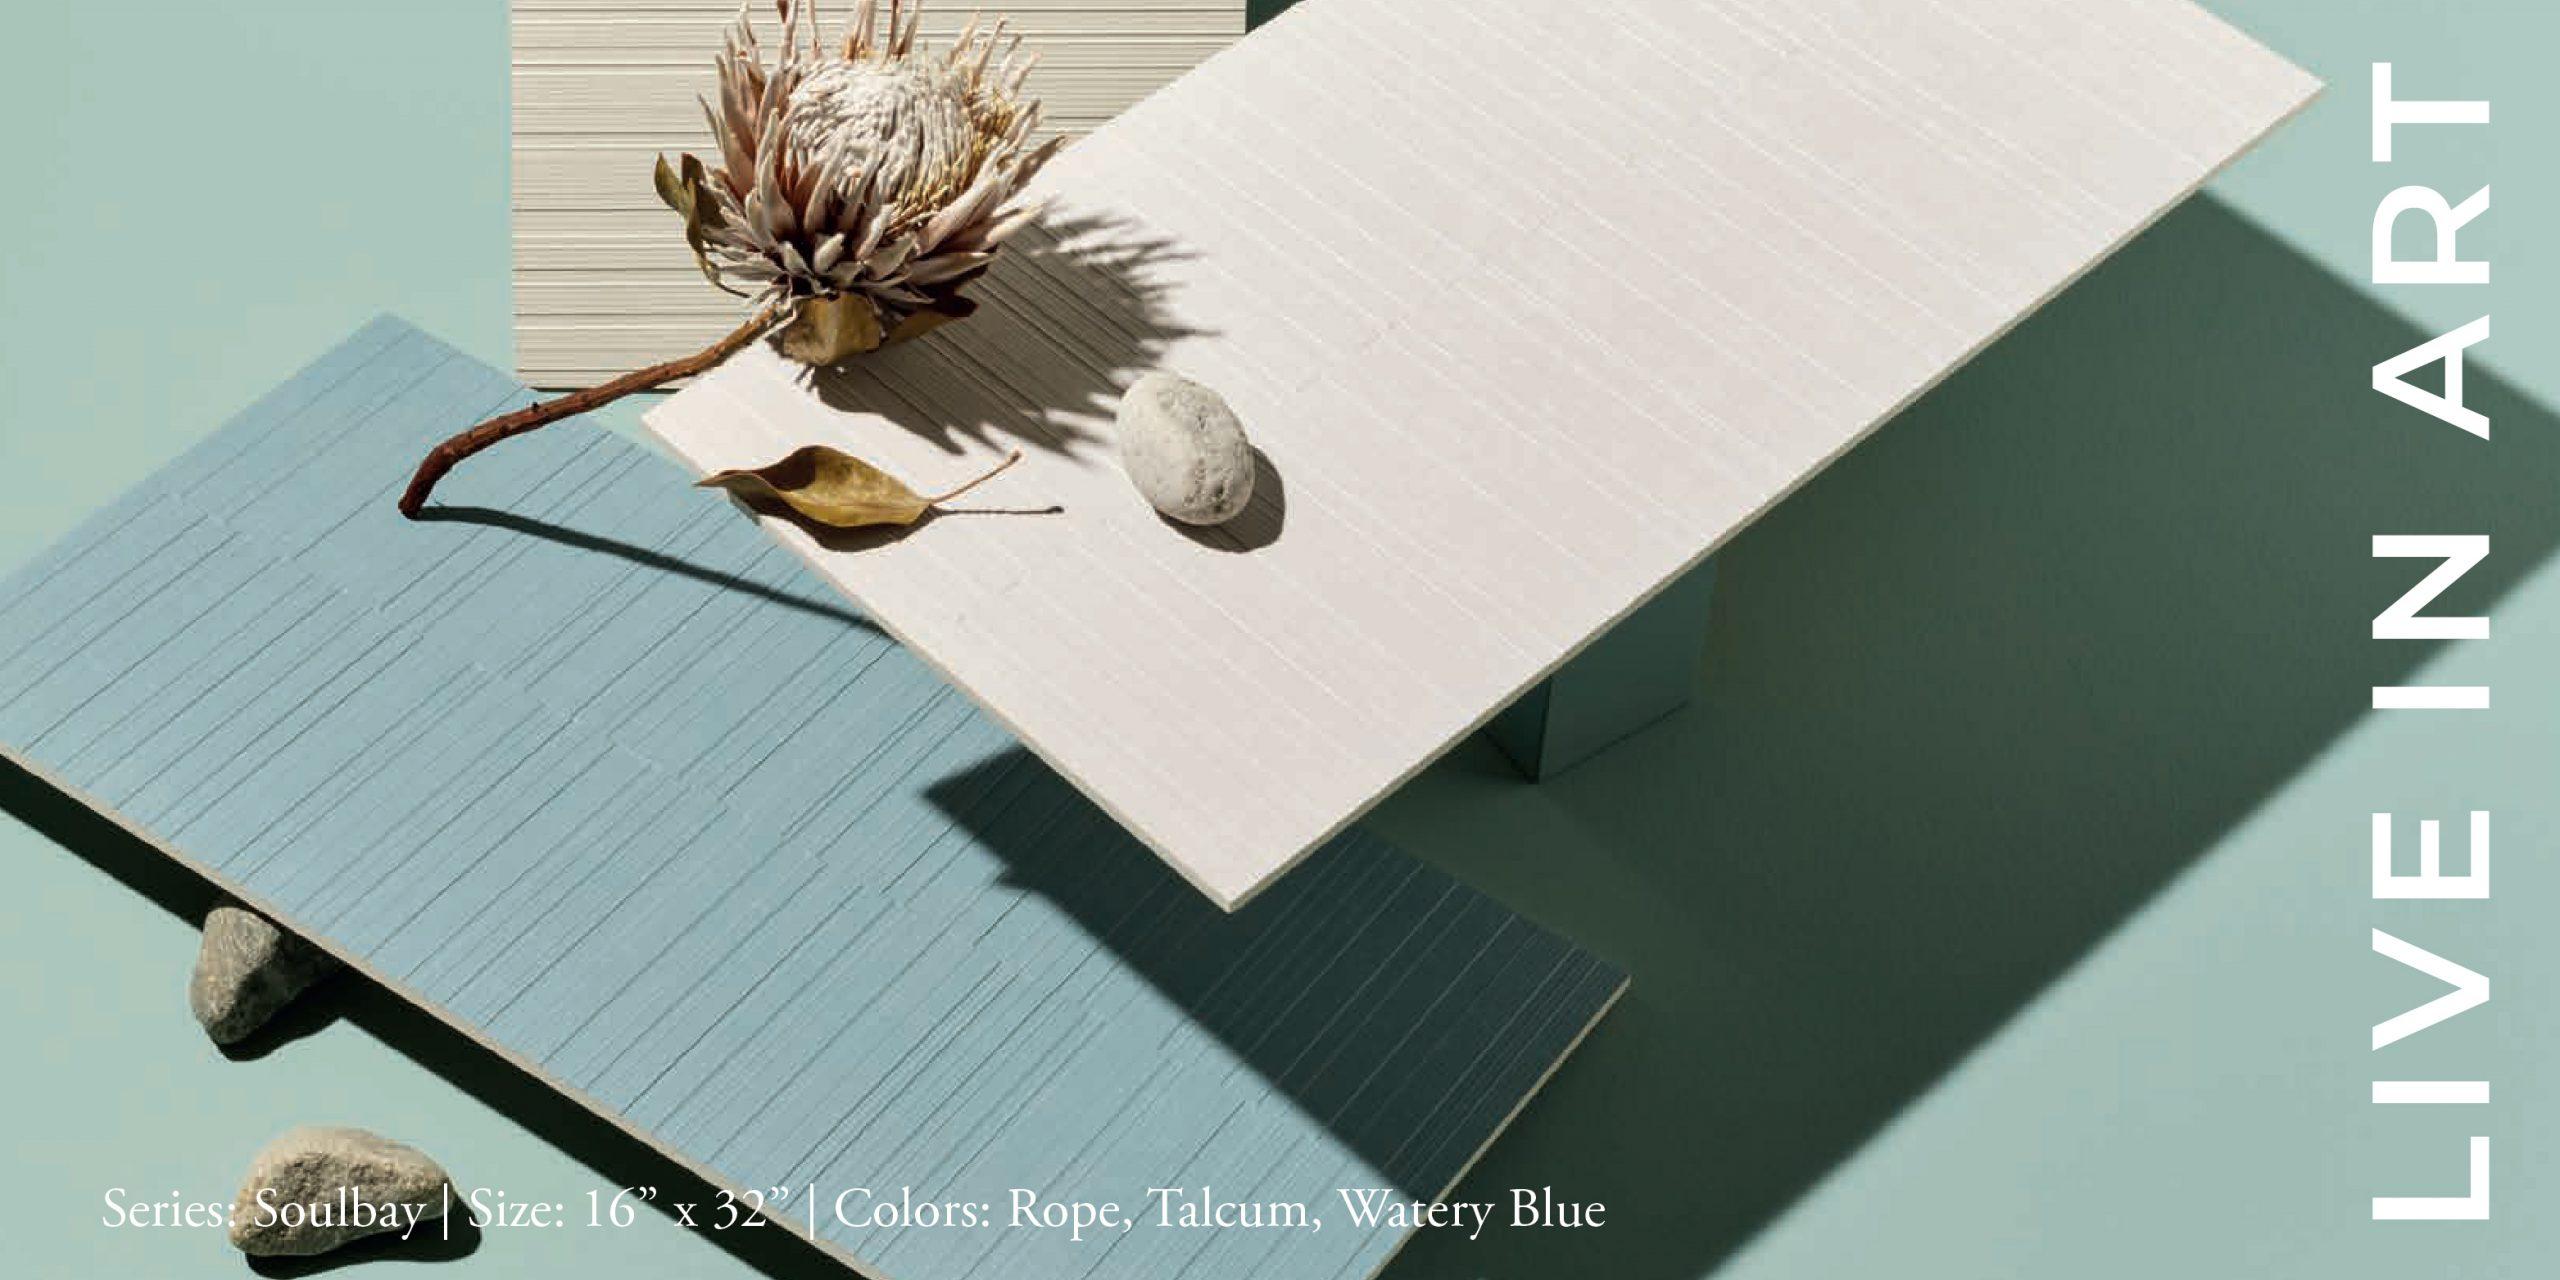 Soulbay Rope, Talcum, Watery Blue 16x32